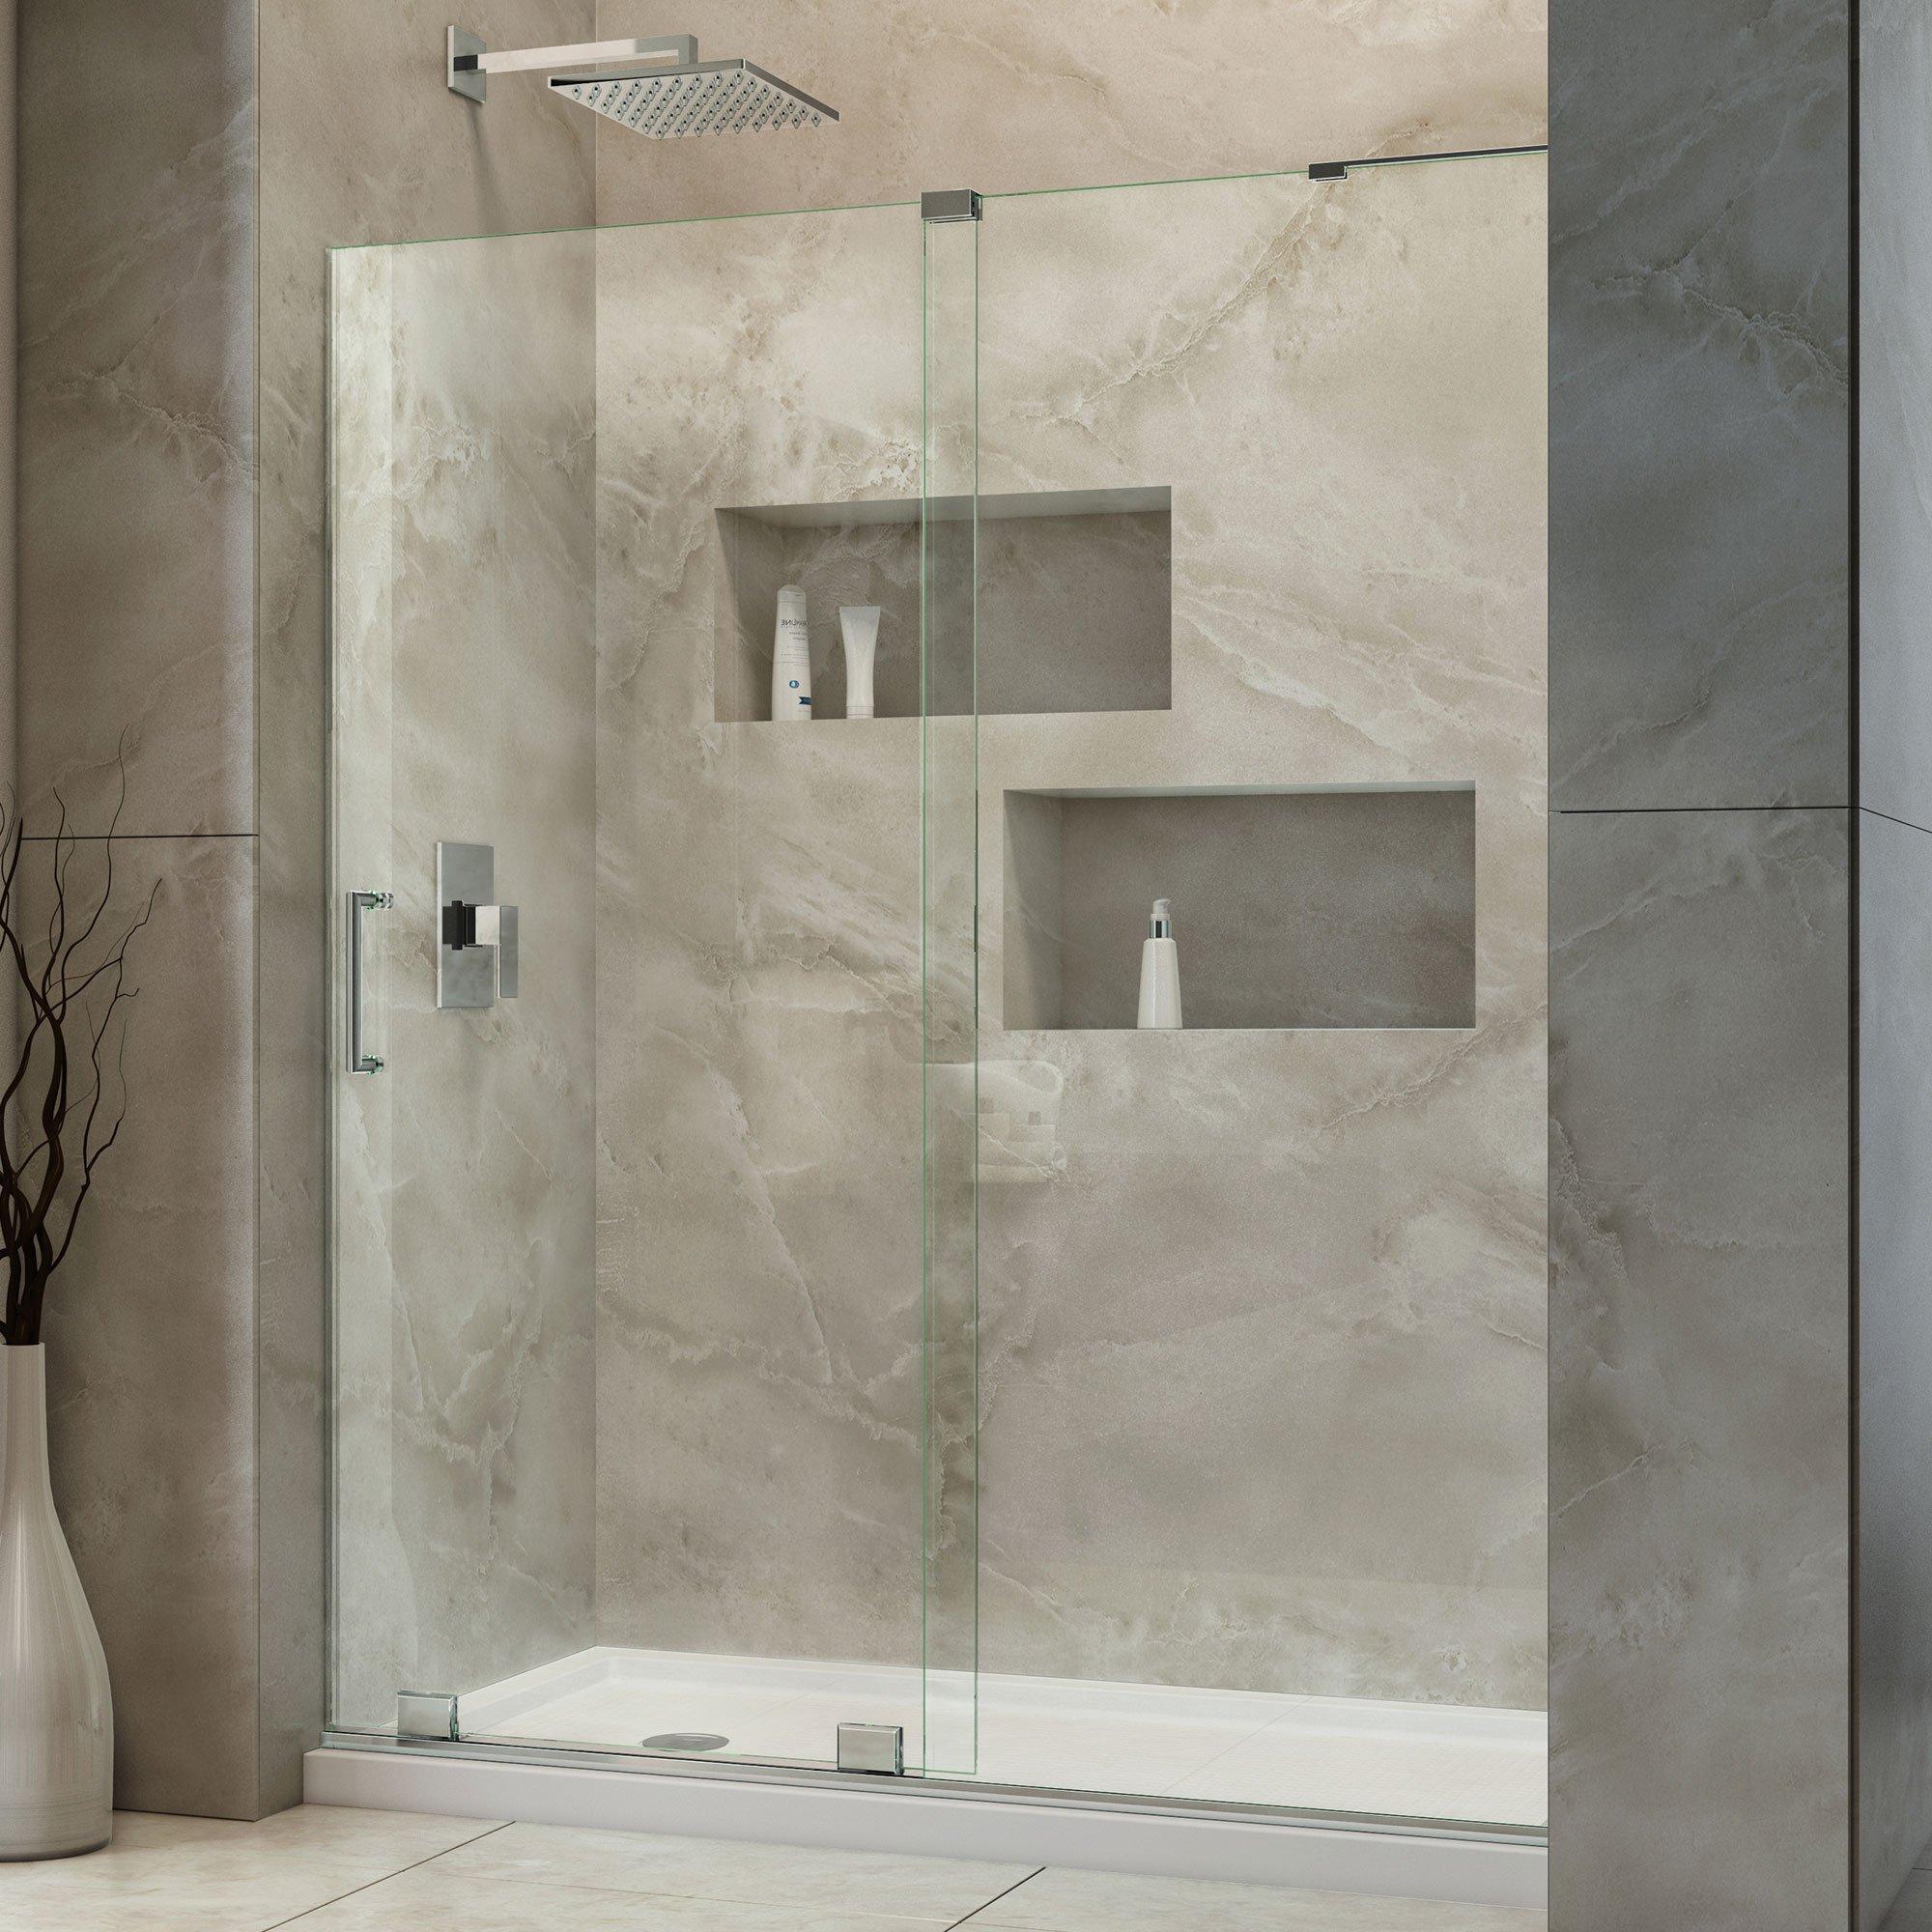 DreamLine Mirage-X 56-60 in. Width, Frameless Sliding Shower Door, 3/8'' Glass, Brushed Nickel Finish by DreamLine (Image #9)